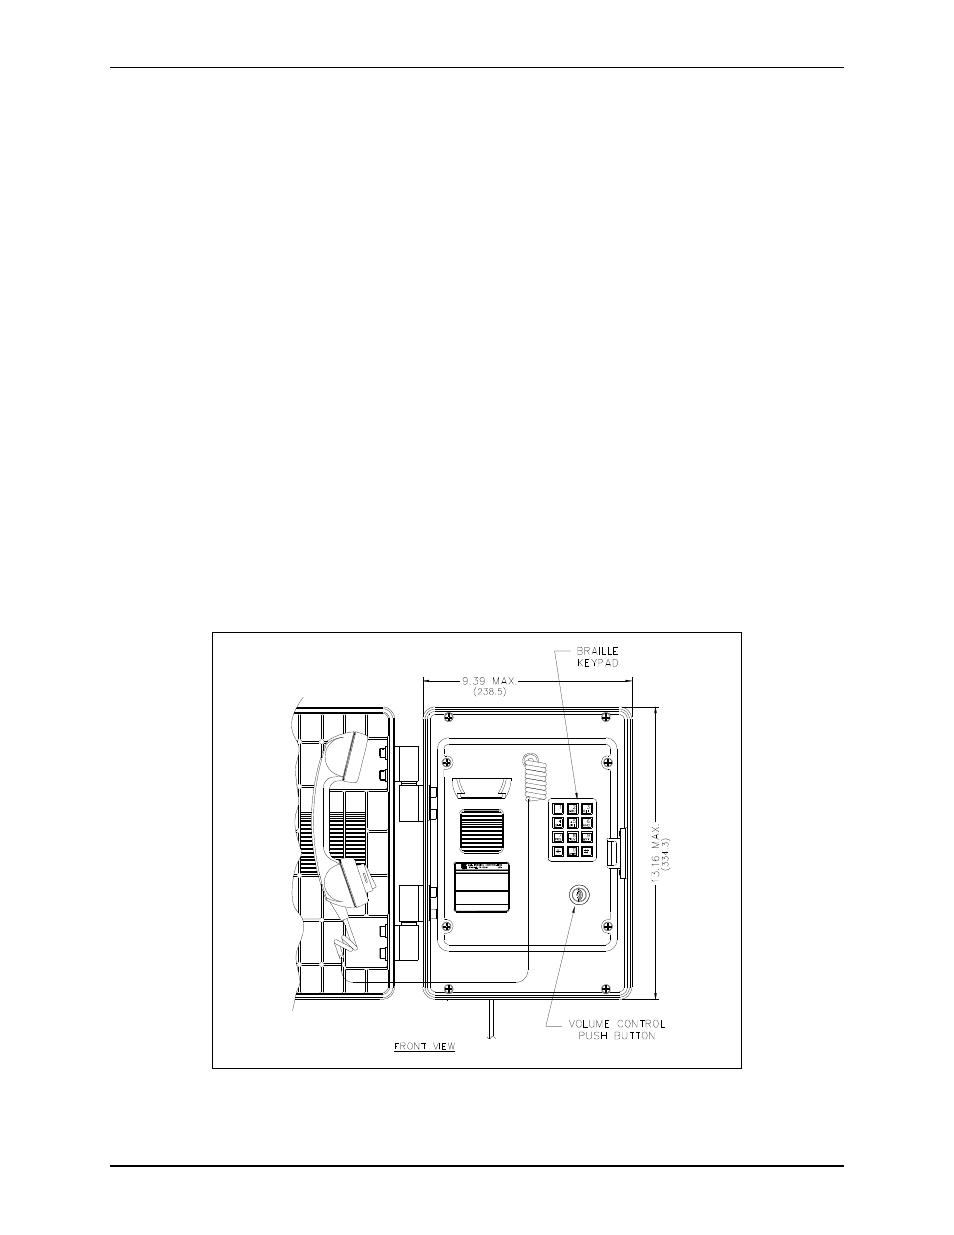 Gai Tronics Wiring Diagram 16 Pins